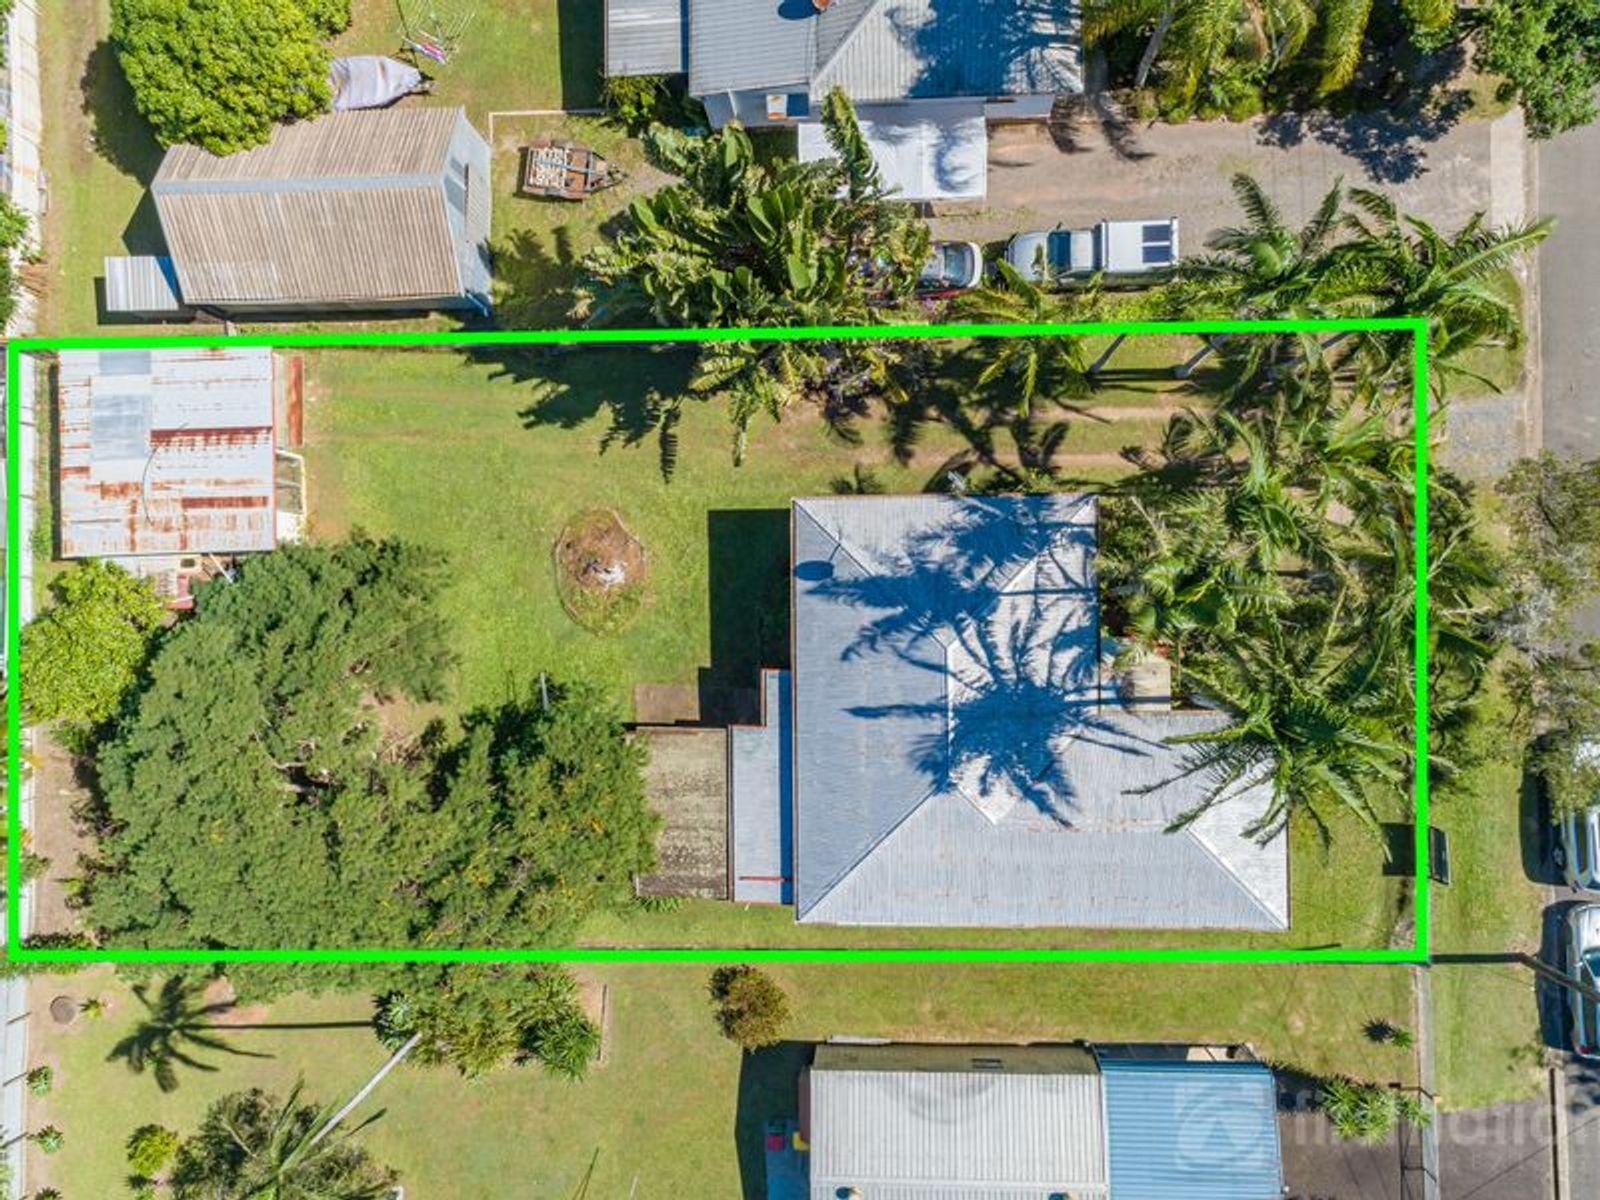 16 DYER STREET, Landsborough, QLD 4550